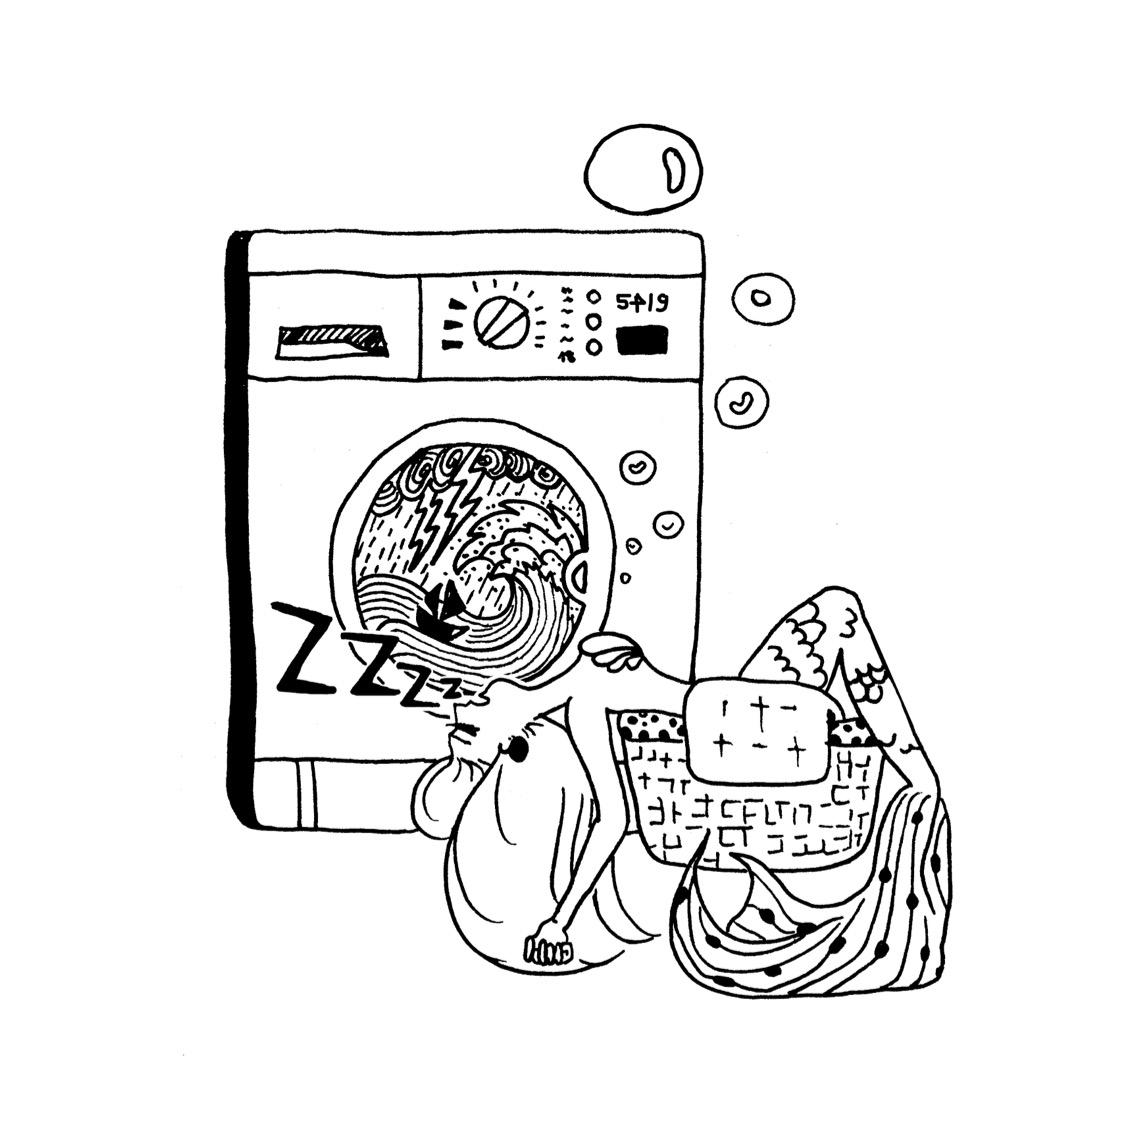 1136x1136 Mermaid Sleeping In Laundry Basket 5419 Illustration Junkie